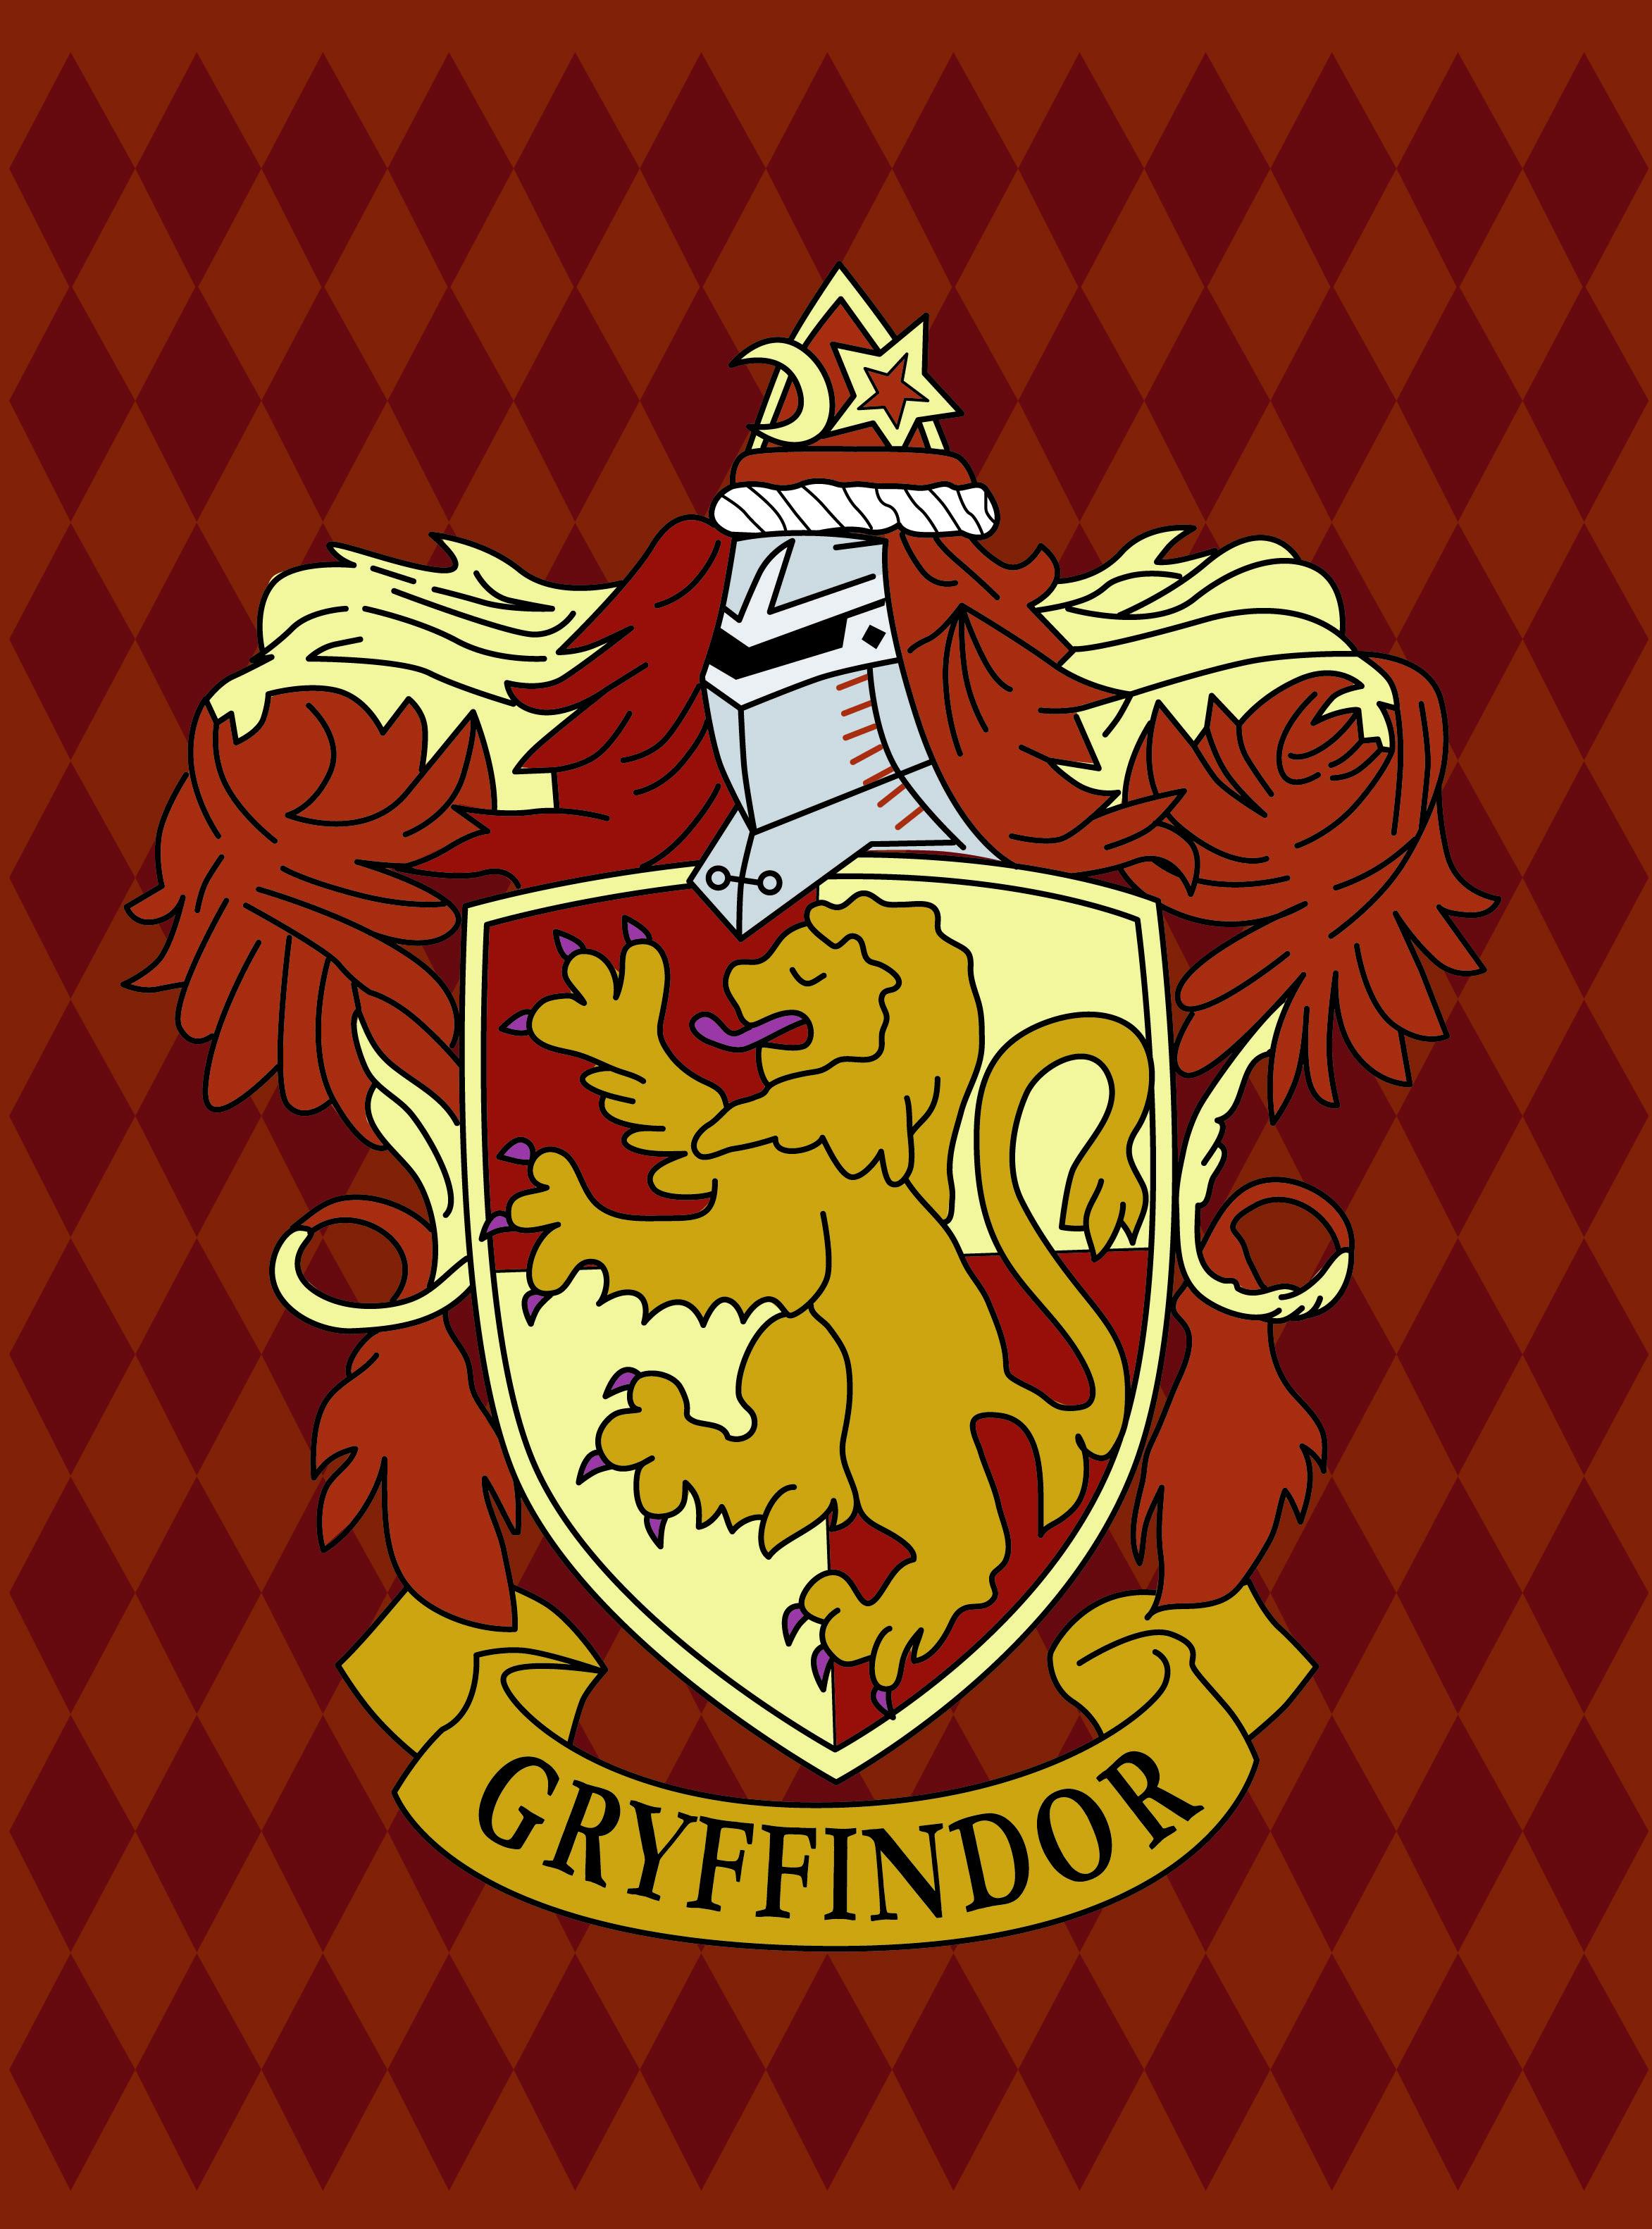 Official Gryffindor Cr...